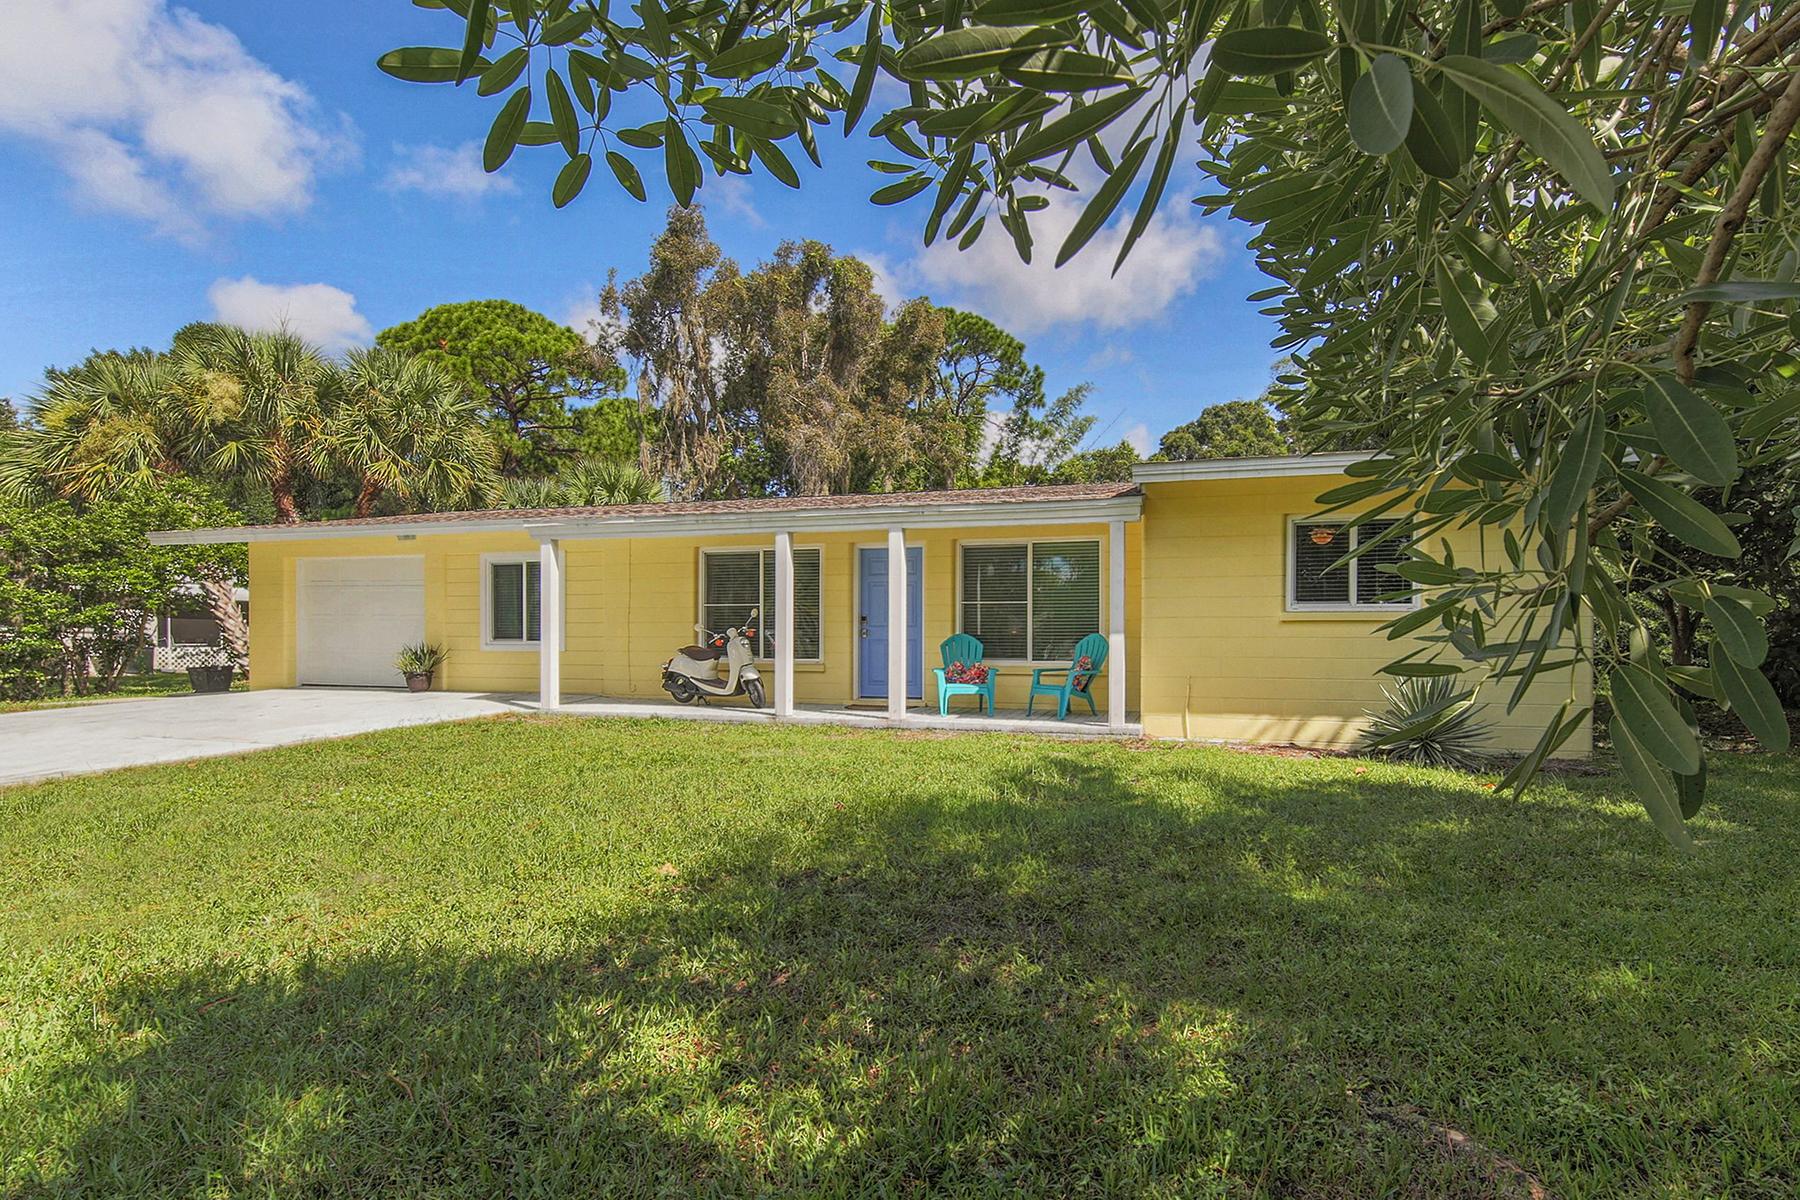 Single Family Home for Sale at NOKOMIS 141 Gulf Ave Nokomis, Florida, 34275 United States